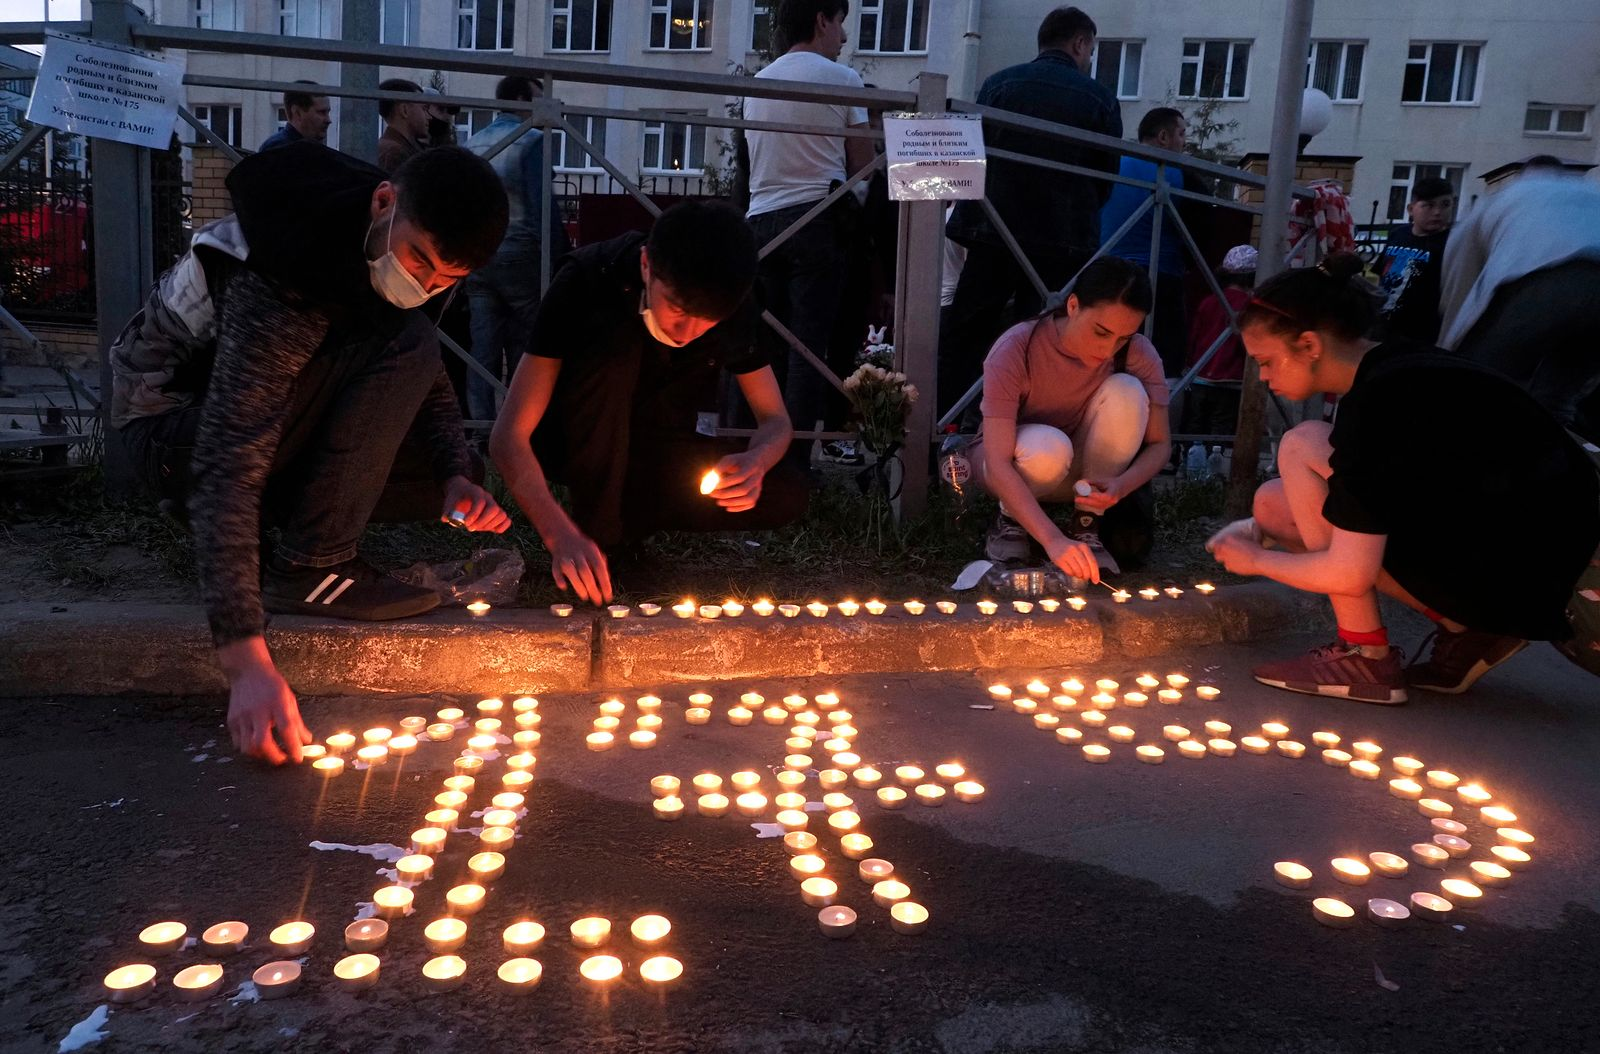 Angriff auf russische Schule